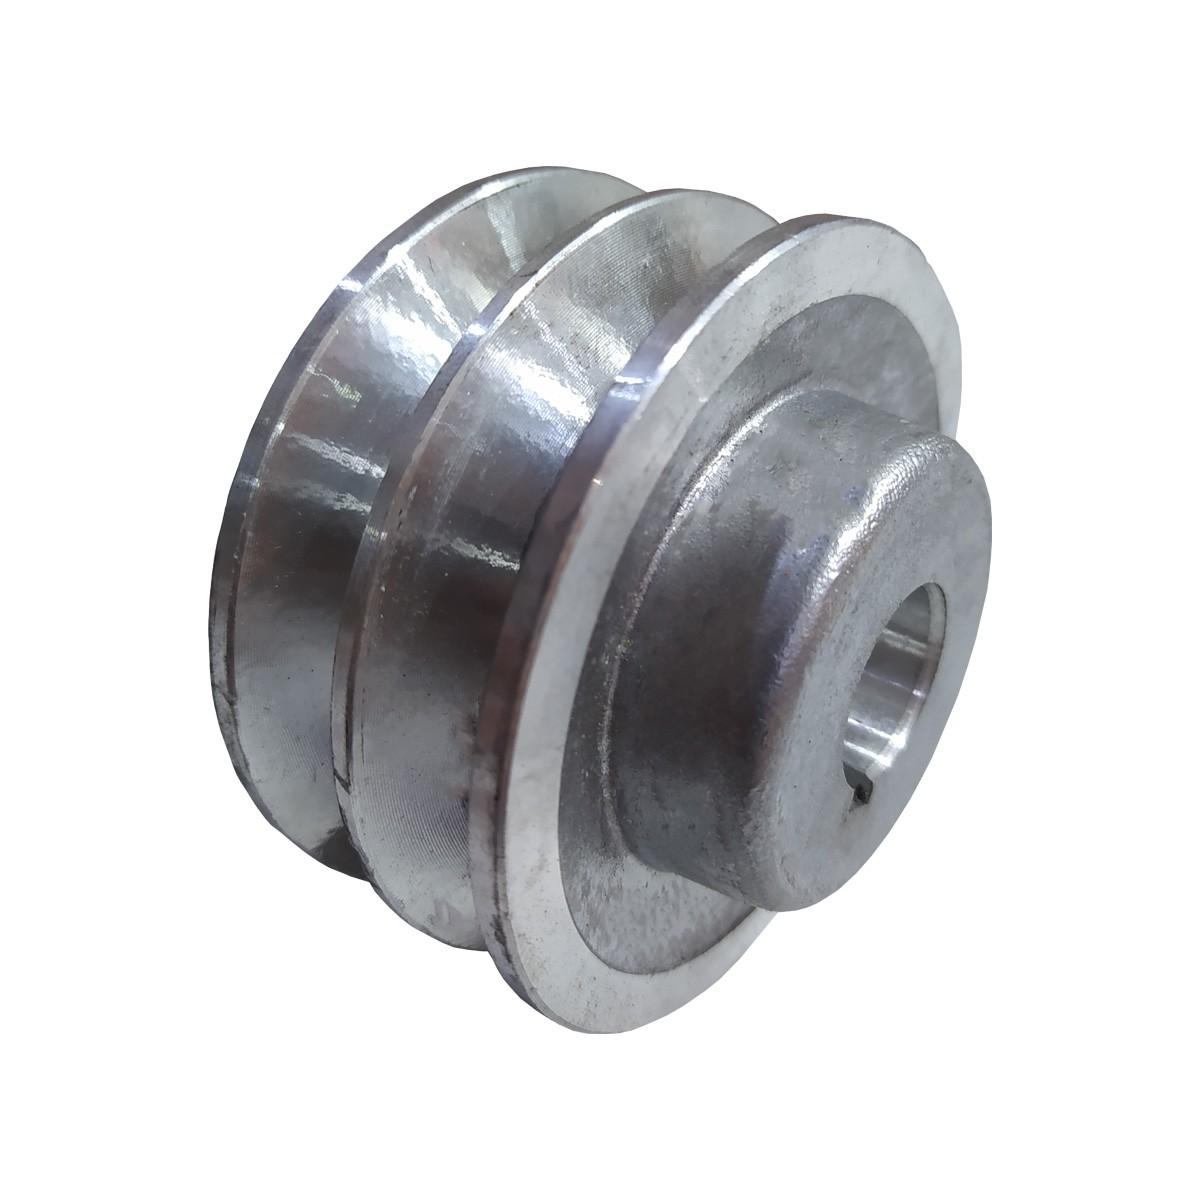 Polia De Aluminio 65mm Furo 19mm 3/4 Polegadas  2 Canal A Chaveta